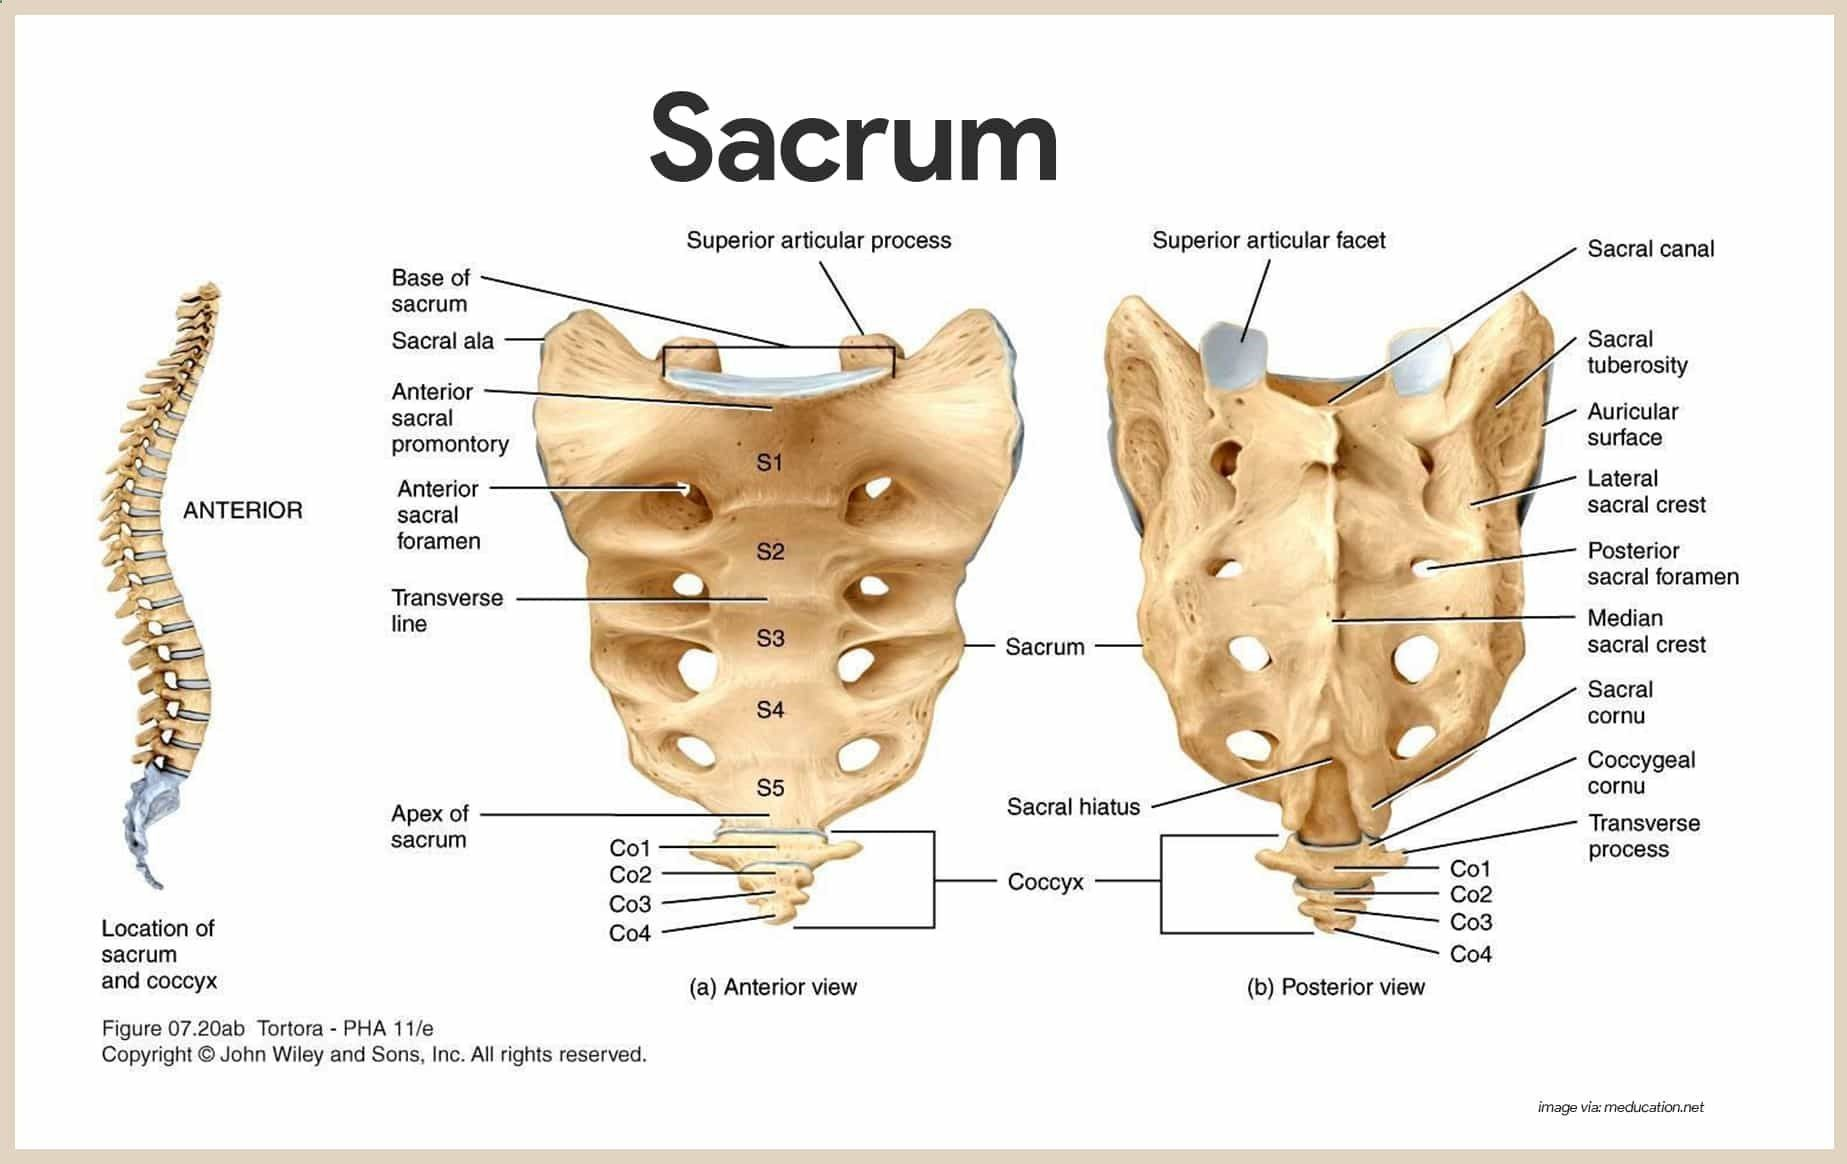 Sacrum Skeletal System Anatomy And Physiology For Nurses Nurseslabs